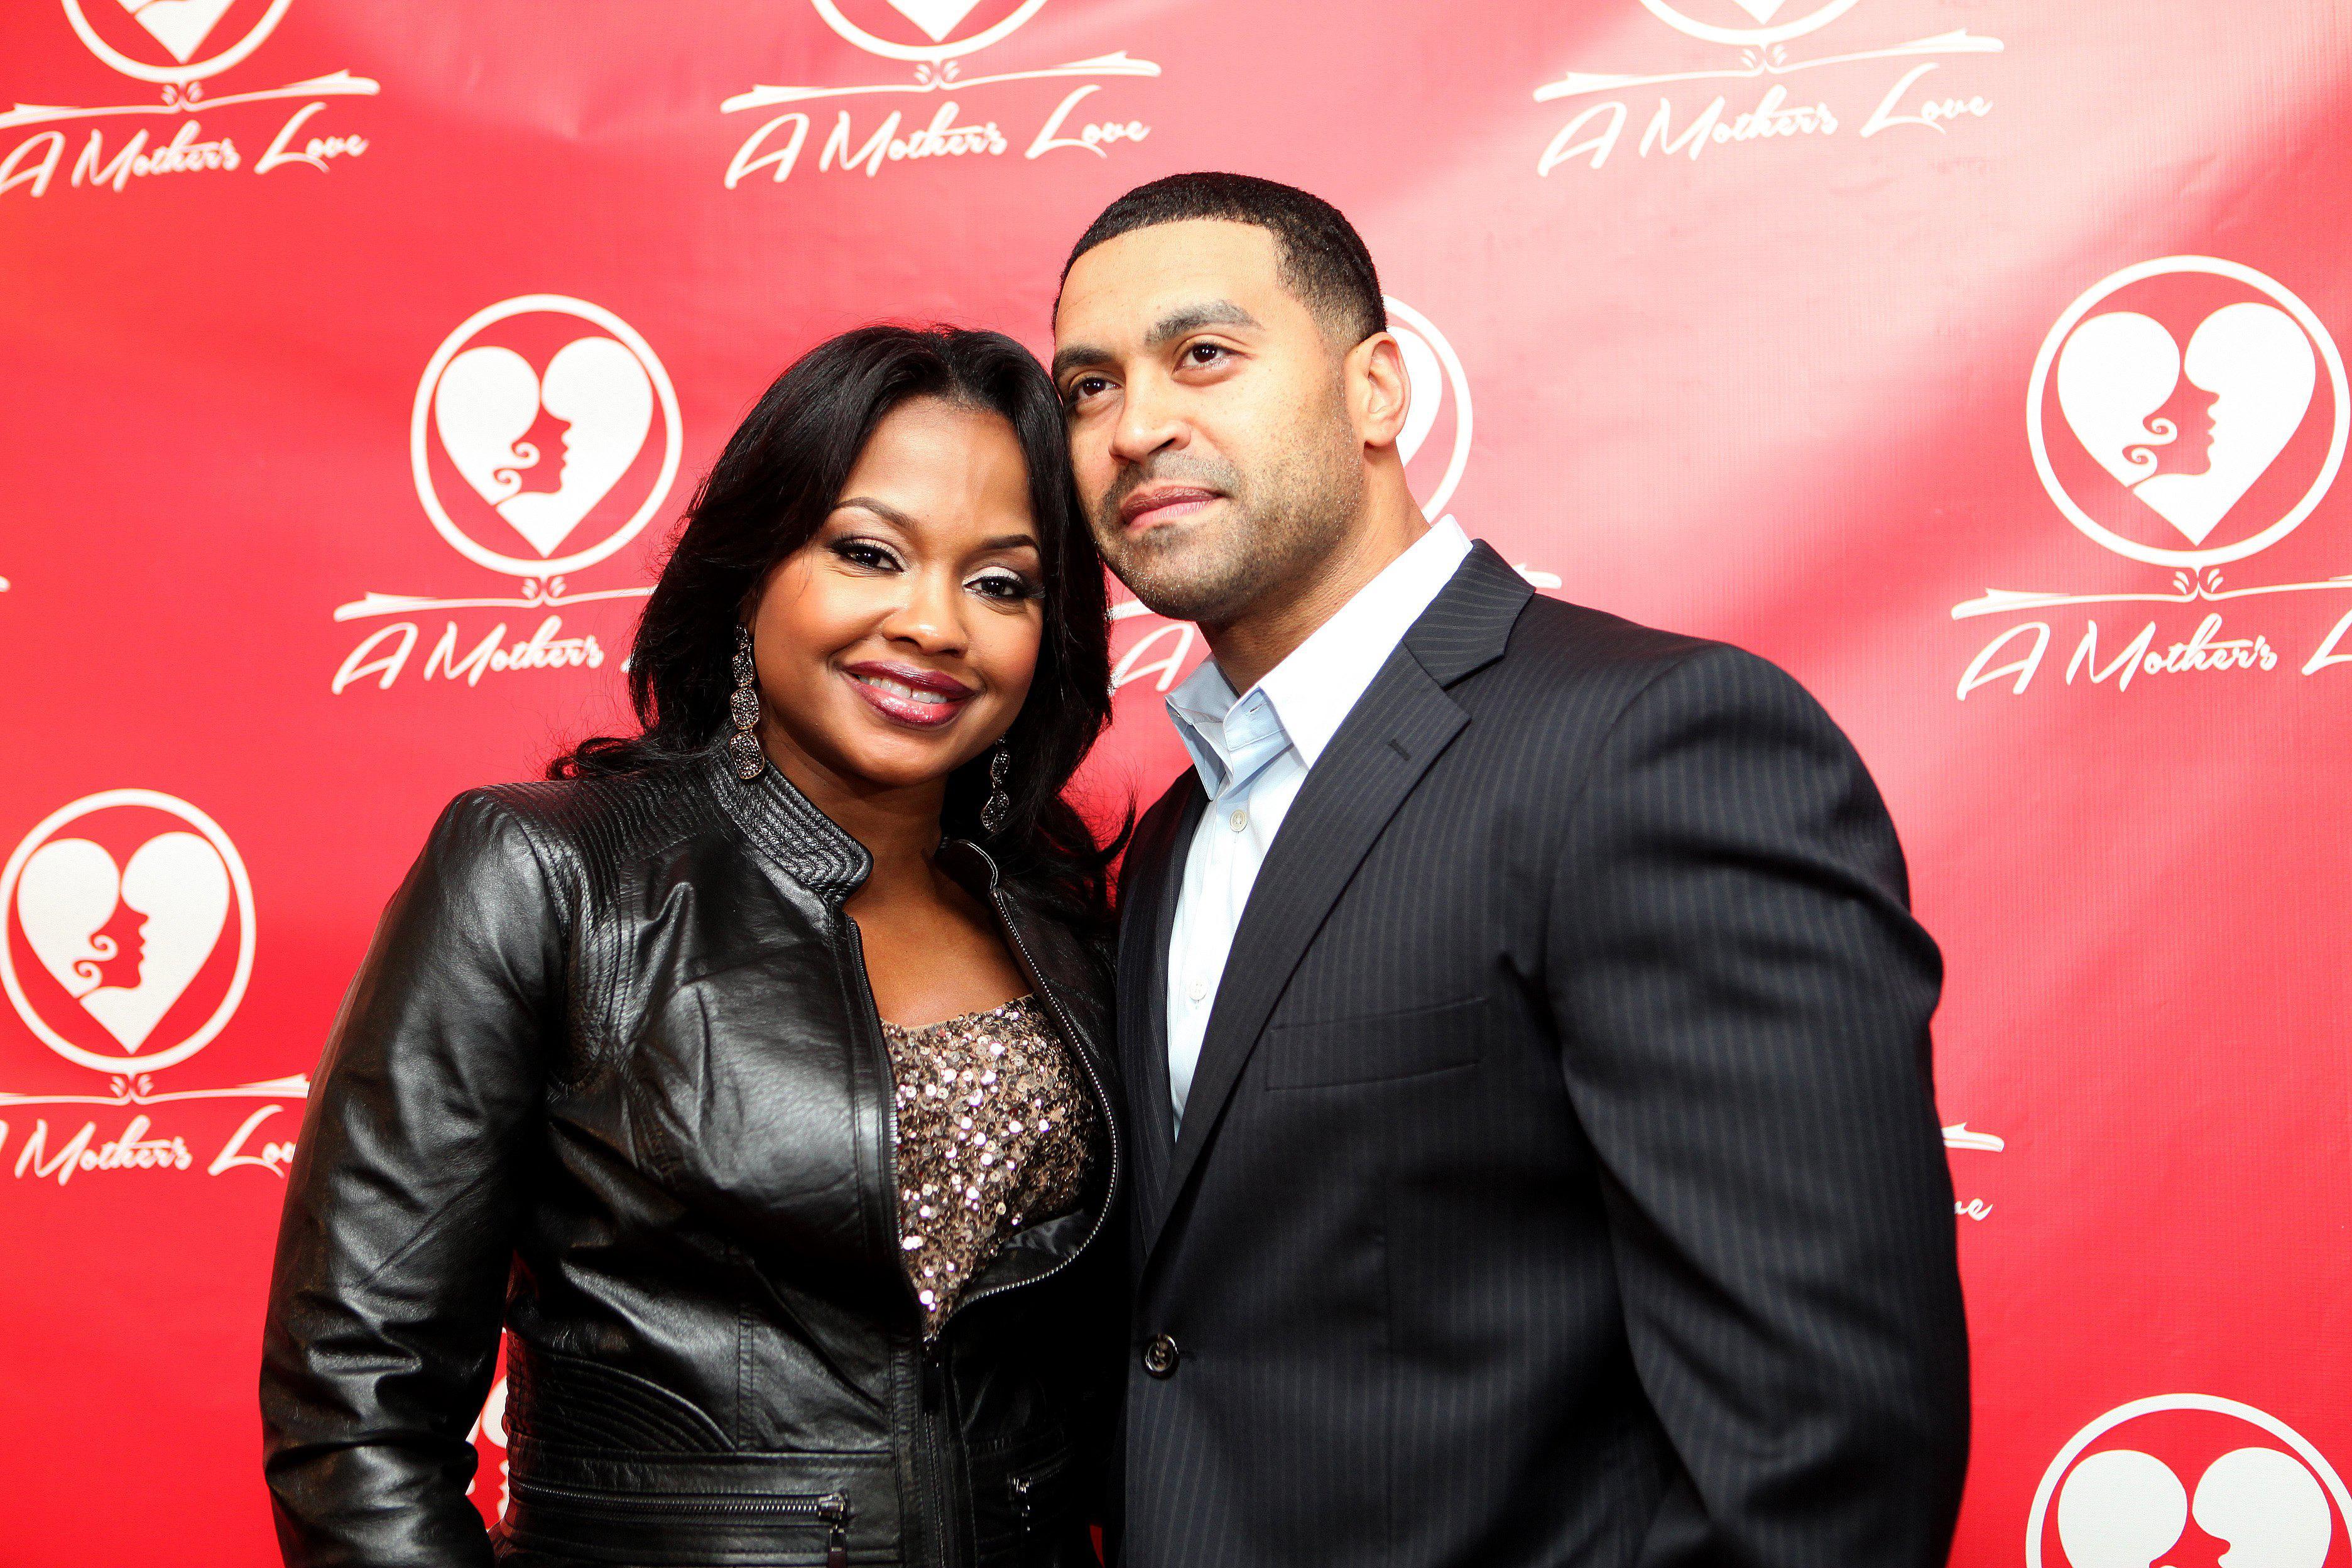 Kandi Burruss and Todd Tucker Presents: 'A Mother's Love' at the Rialto Center For The Arts In Atlanta, Georgia